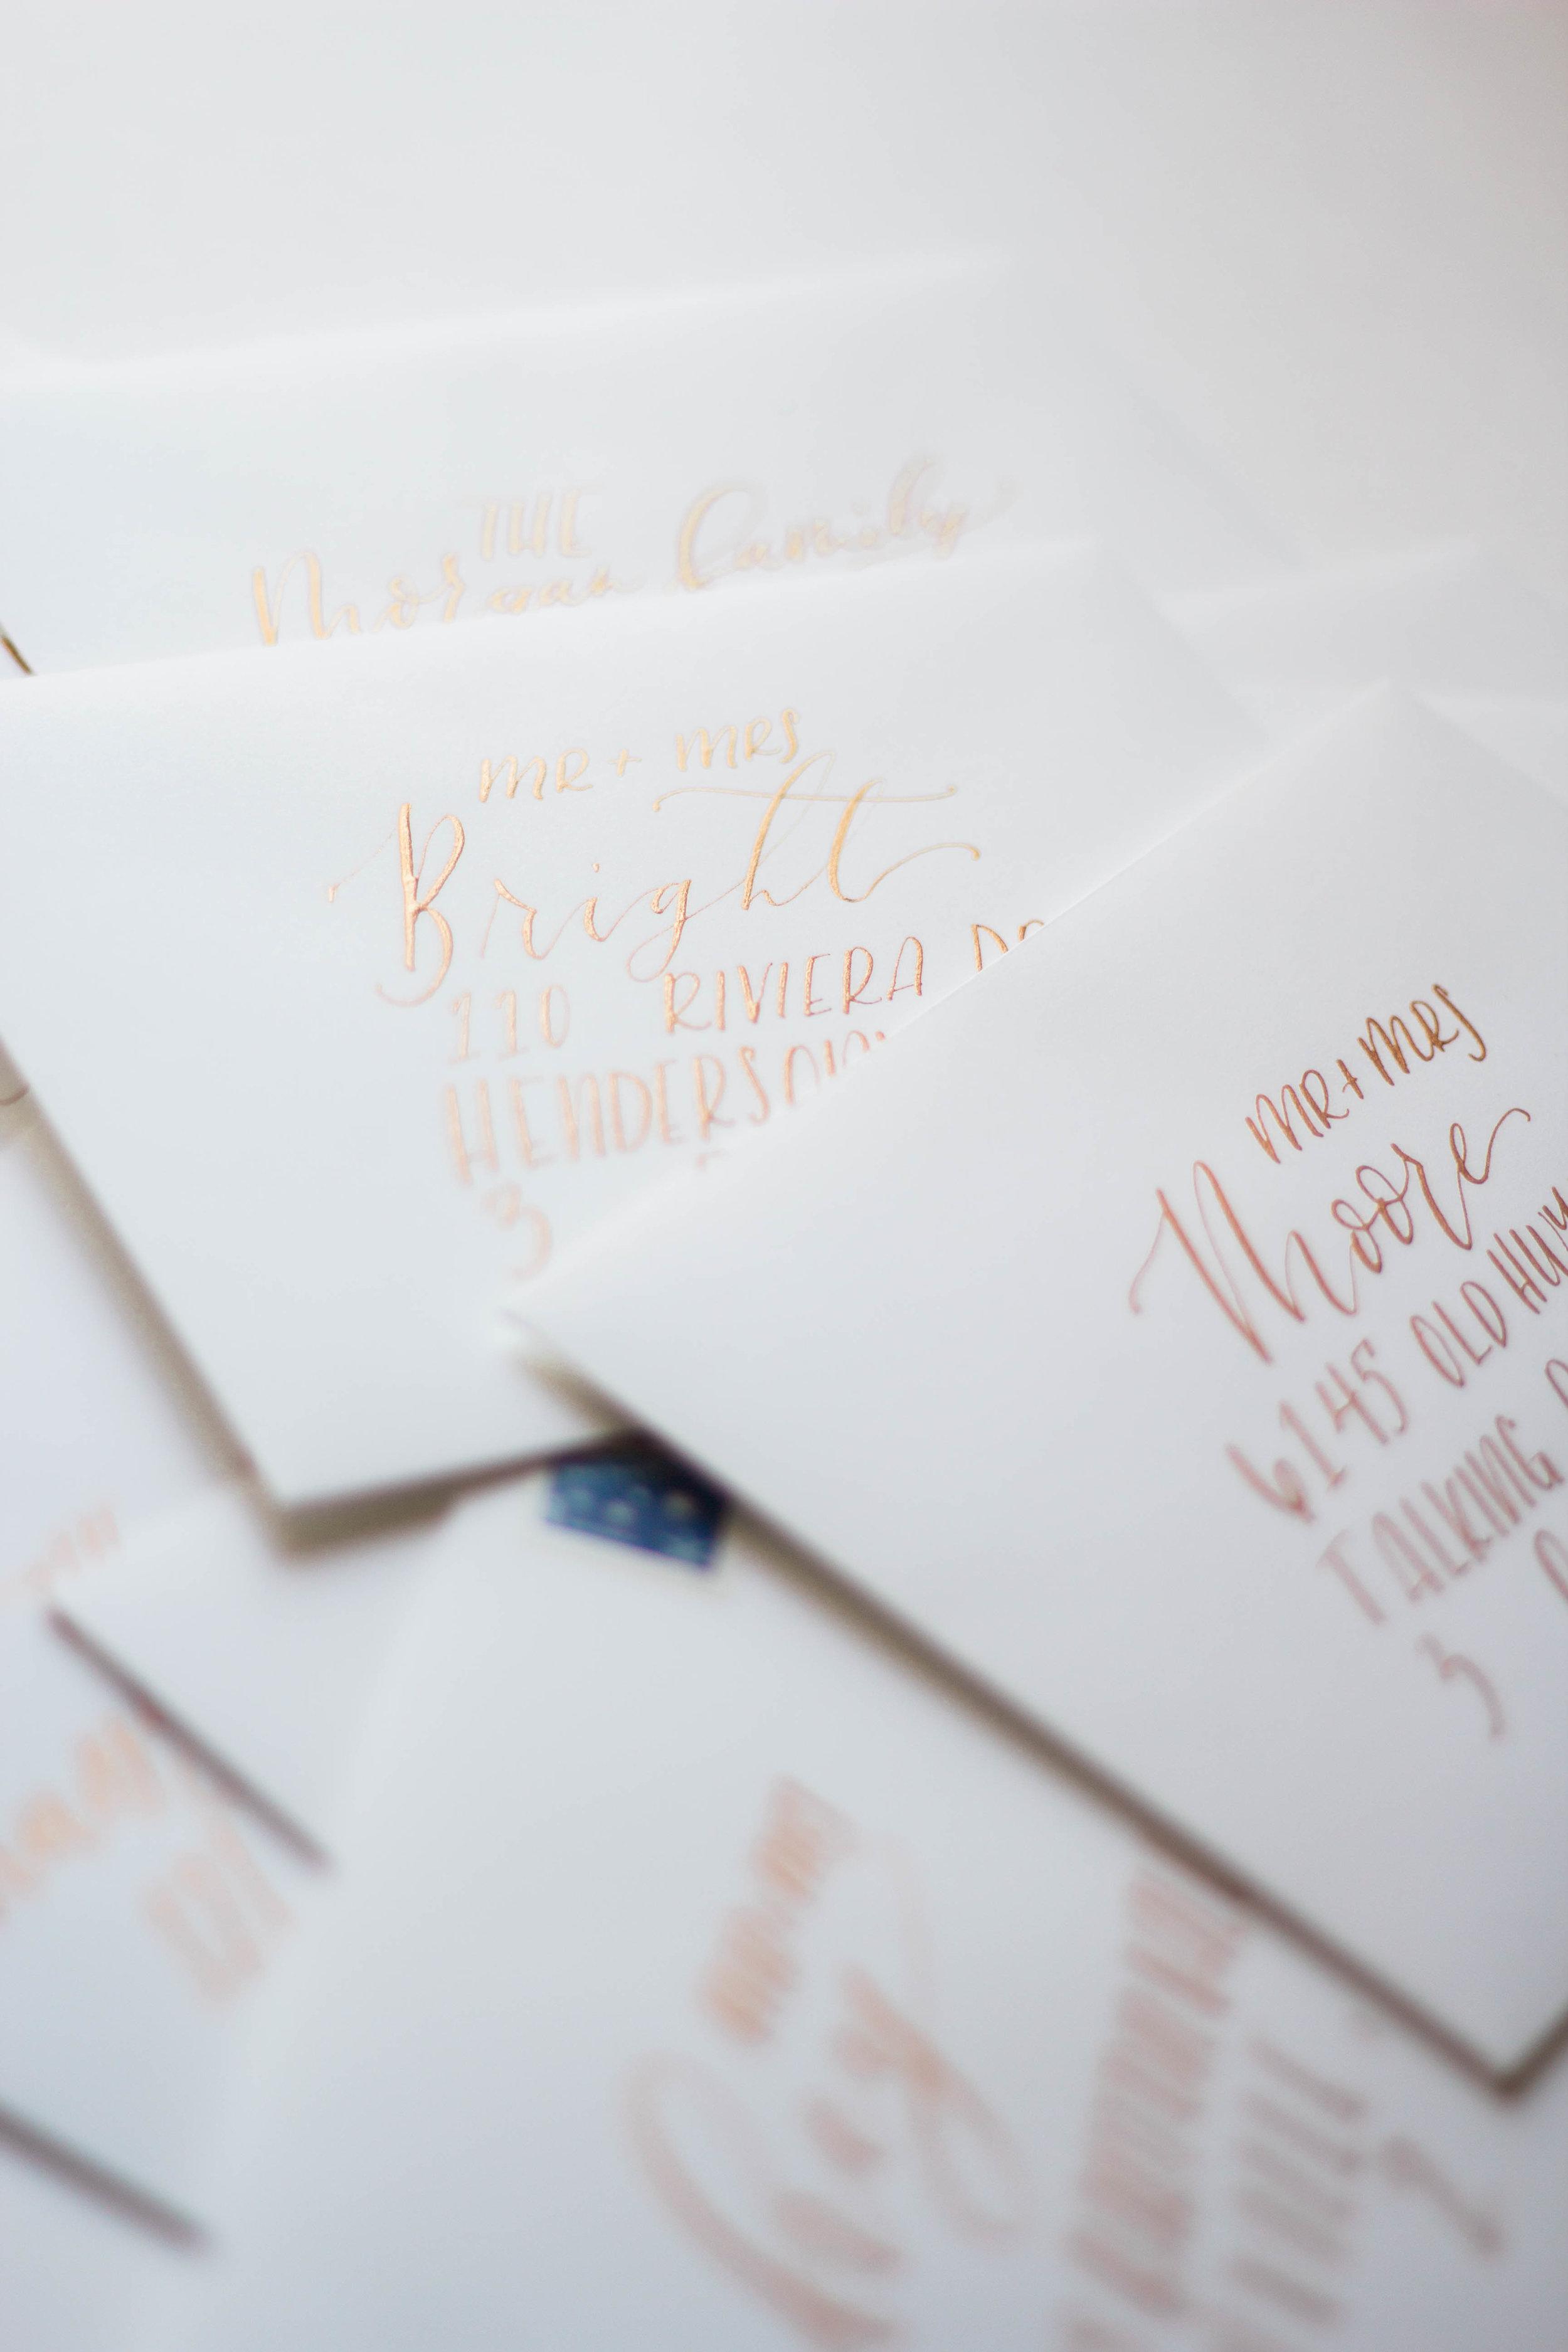 Gold Calligraphy White Envelopes Wedding Invitation | Custom Luxury Wedding Stationery | Lauren Antoniaa Calligraphy and Design